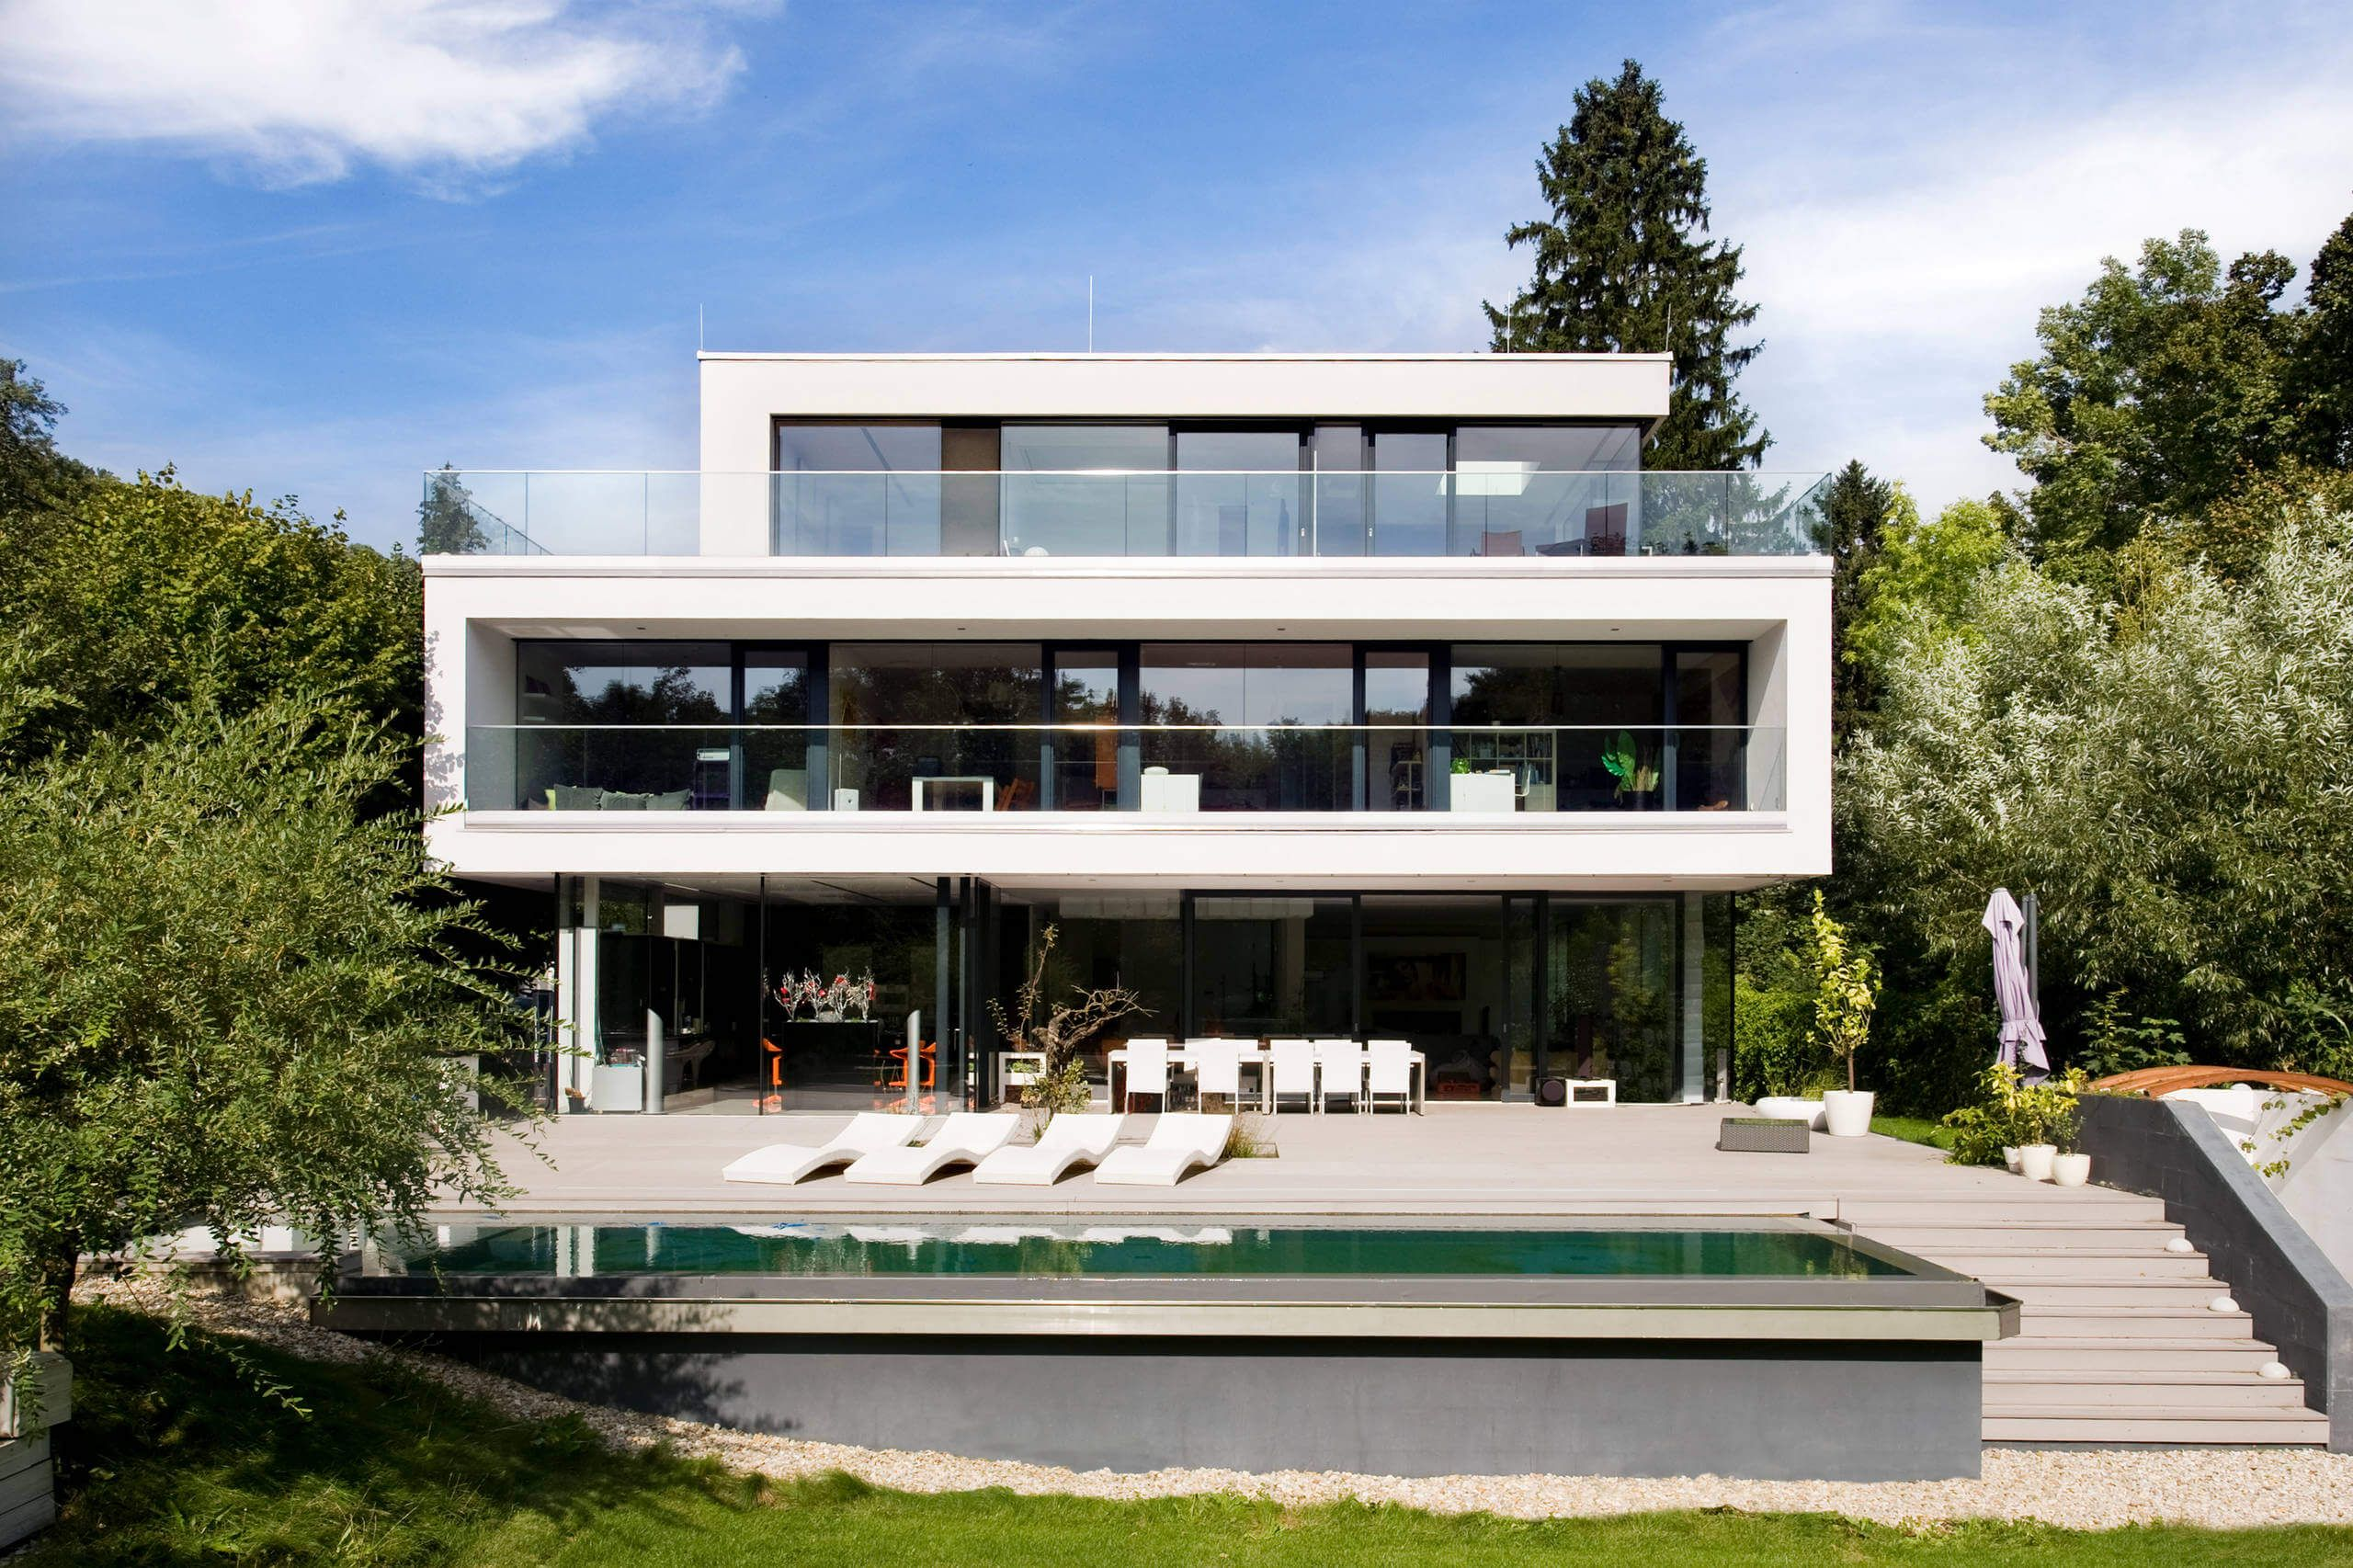 House in Hinterbrühl by Wunschhaus Architektur   House   Pinterest ...